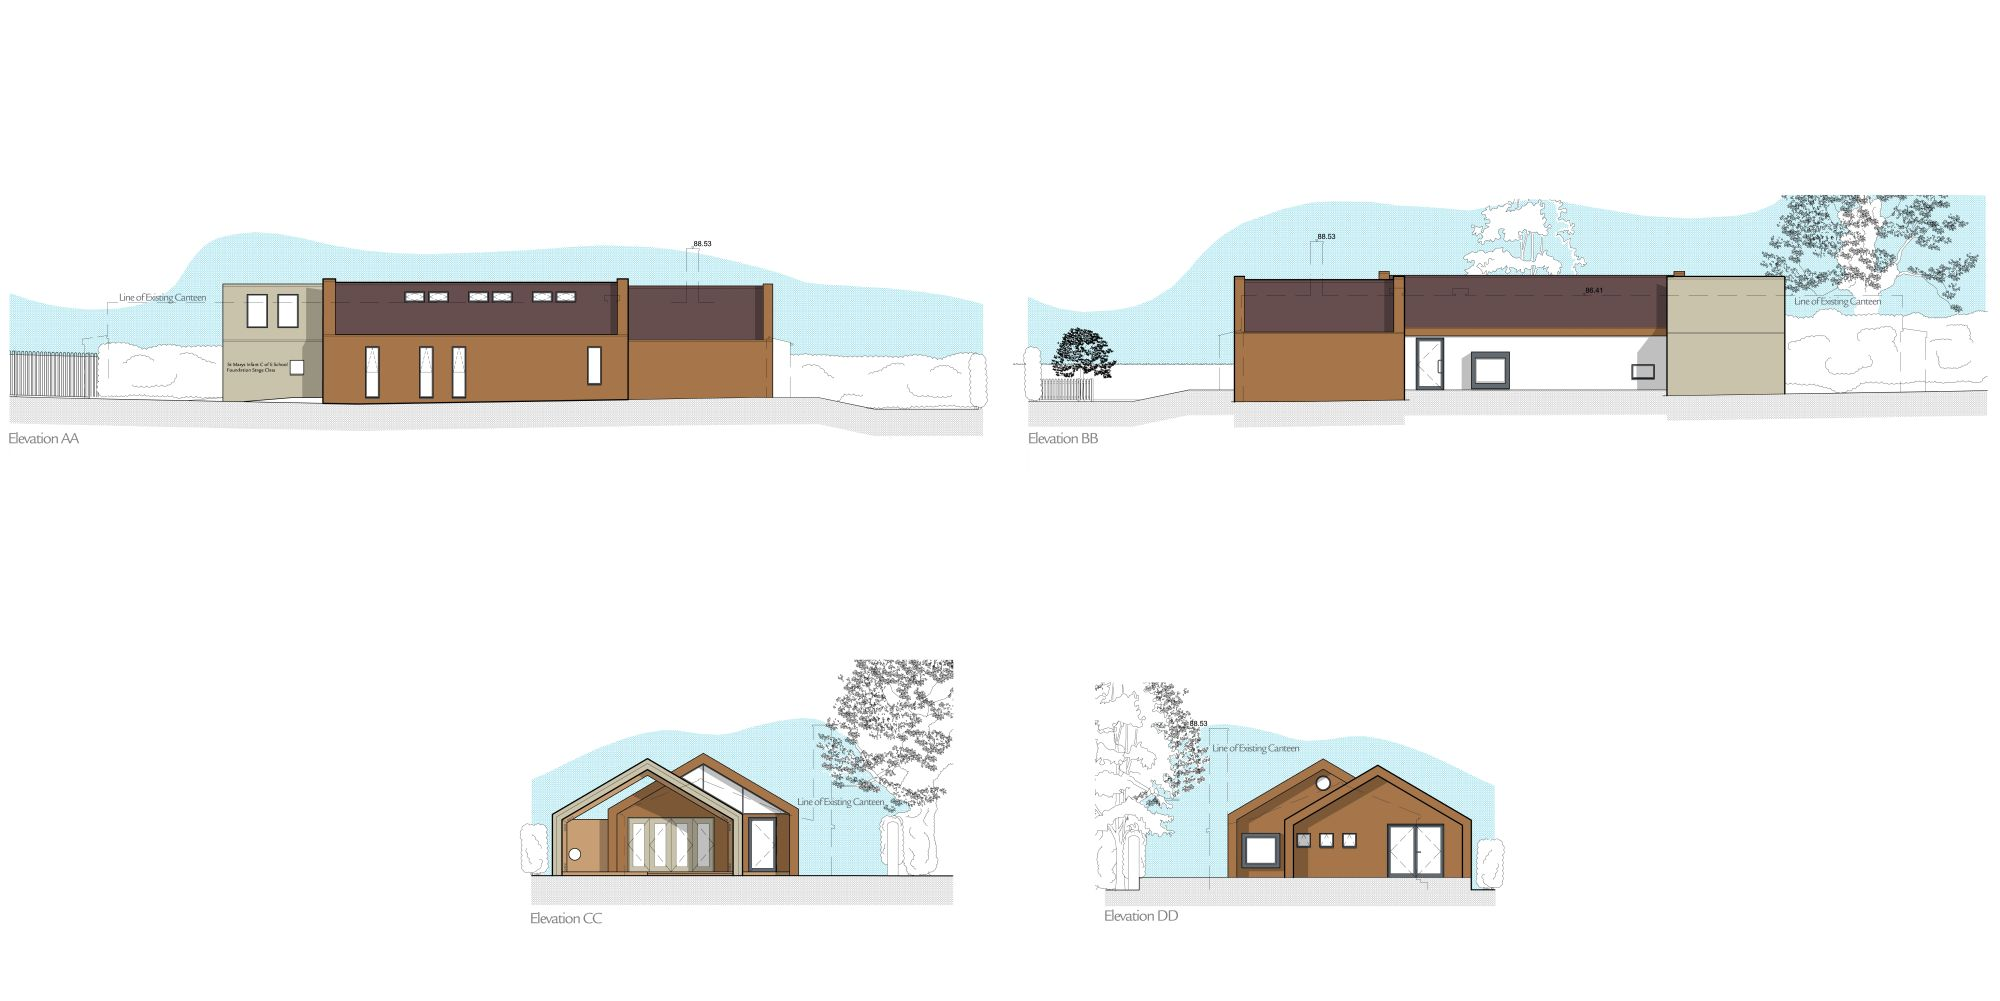 Interior design friendly school plan and sketch of elevation also layout information in contemporary children